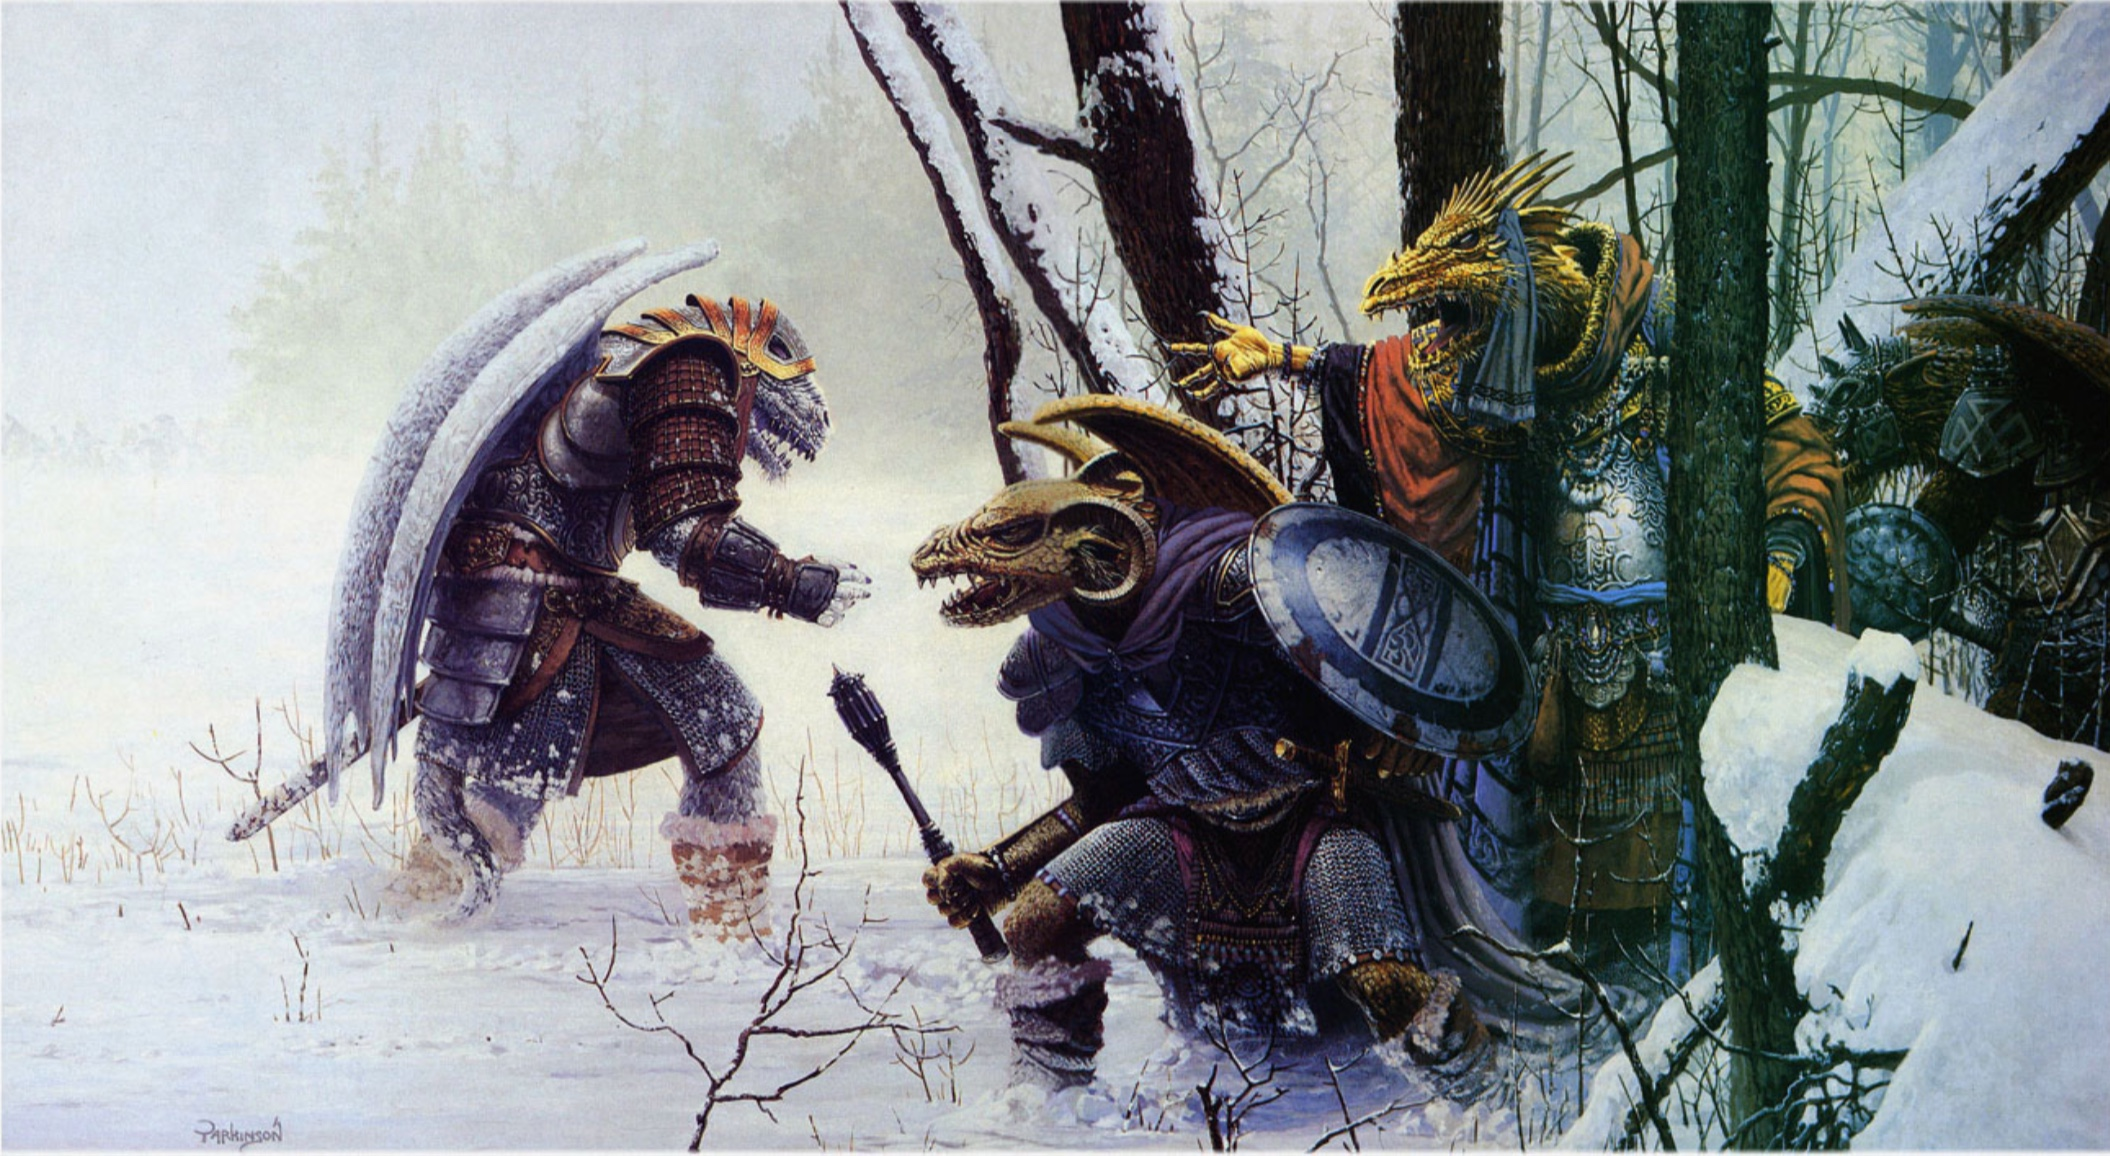 Dragonlance - War of the Lance